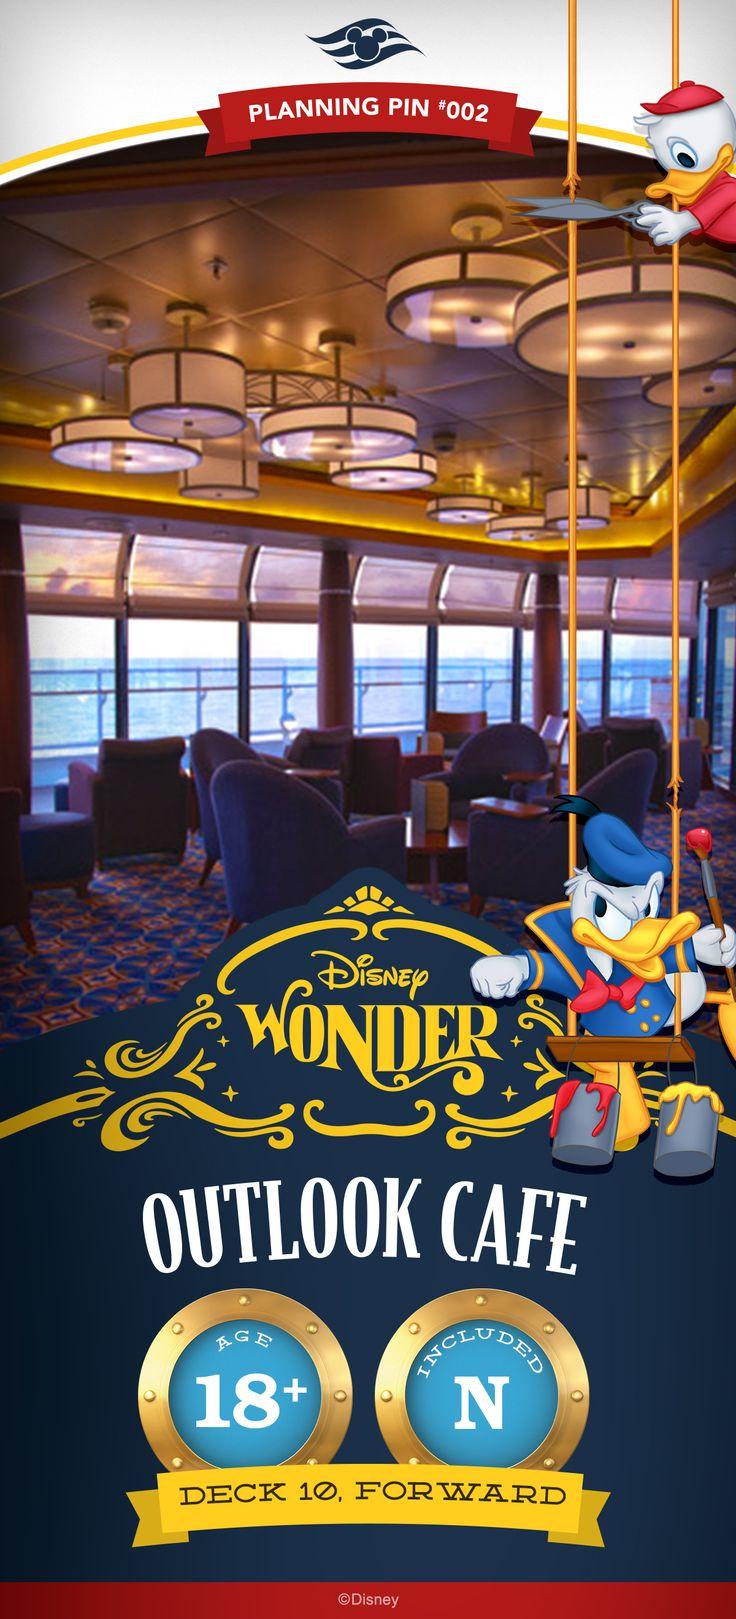 Disney Cruise Line Planning Pins | Disney Wonder: Outlook Cafe